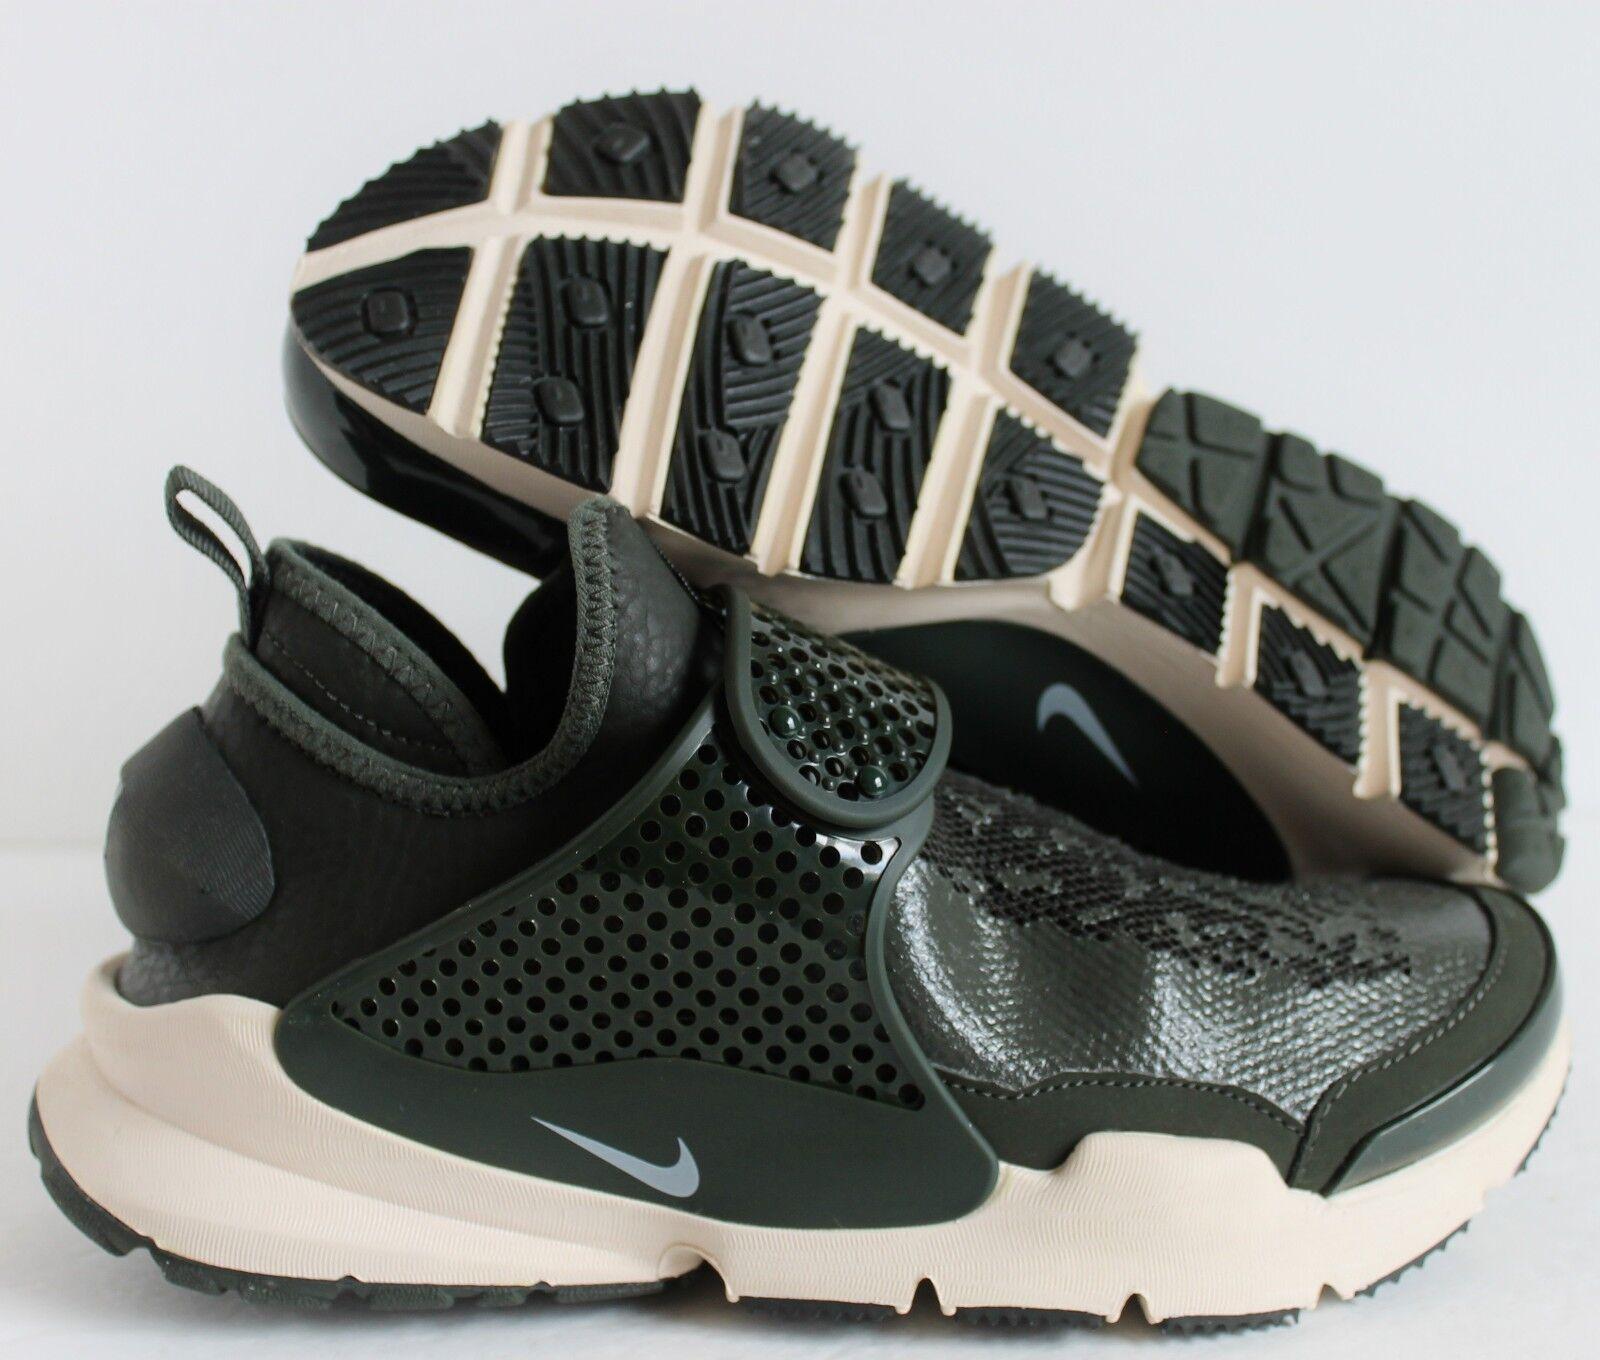 Nike x Stone Island Sock Dart SP QS Mid Sequoia Green sz 11  [910090-300]